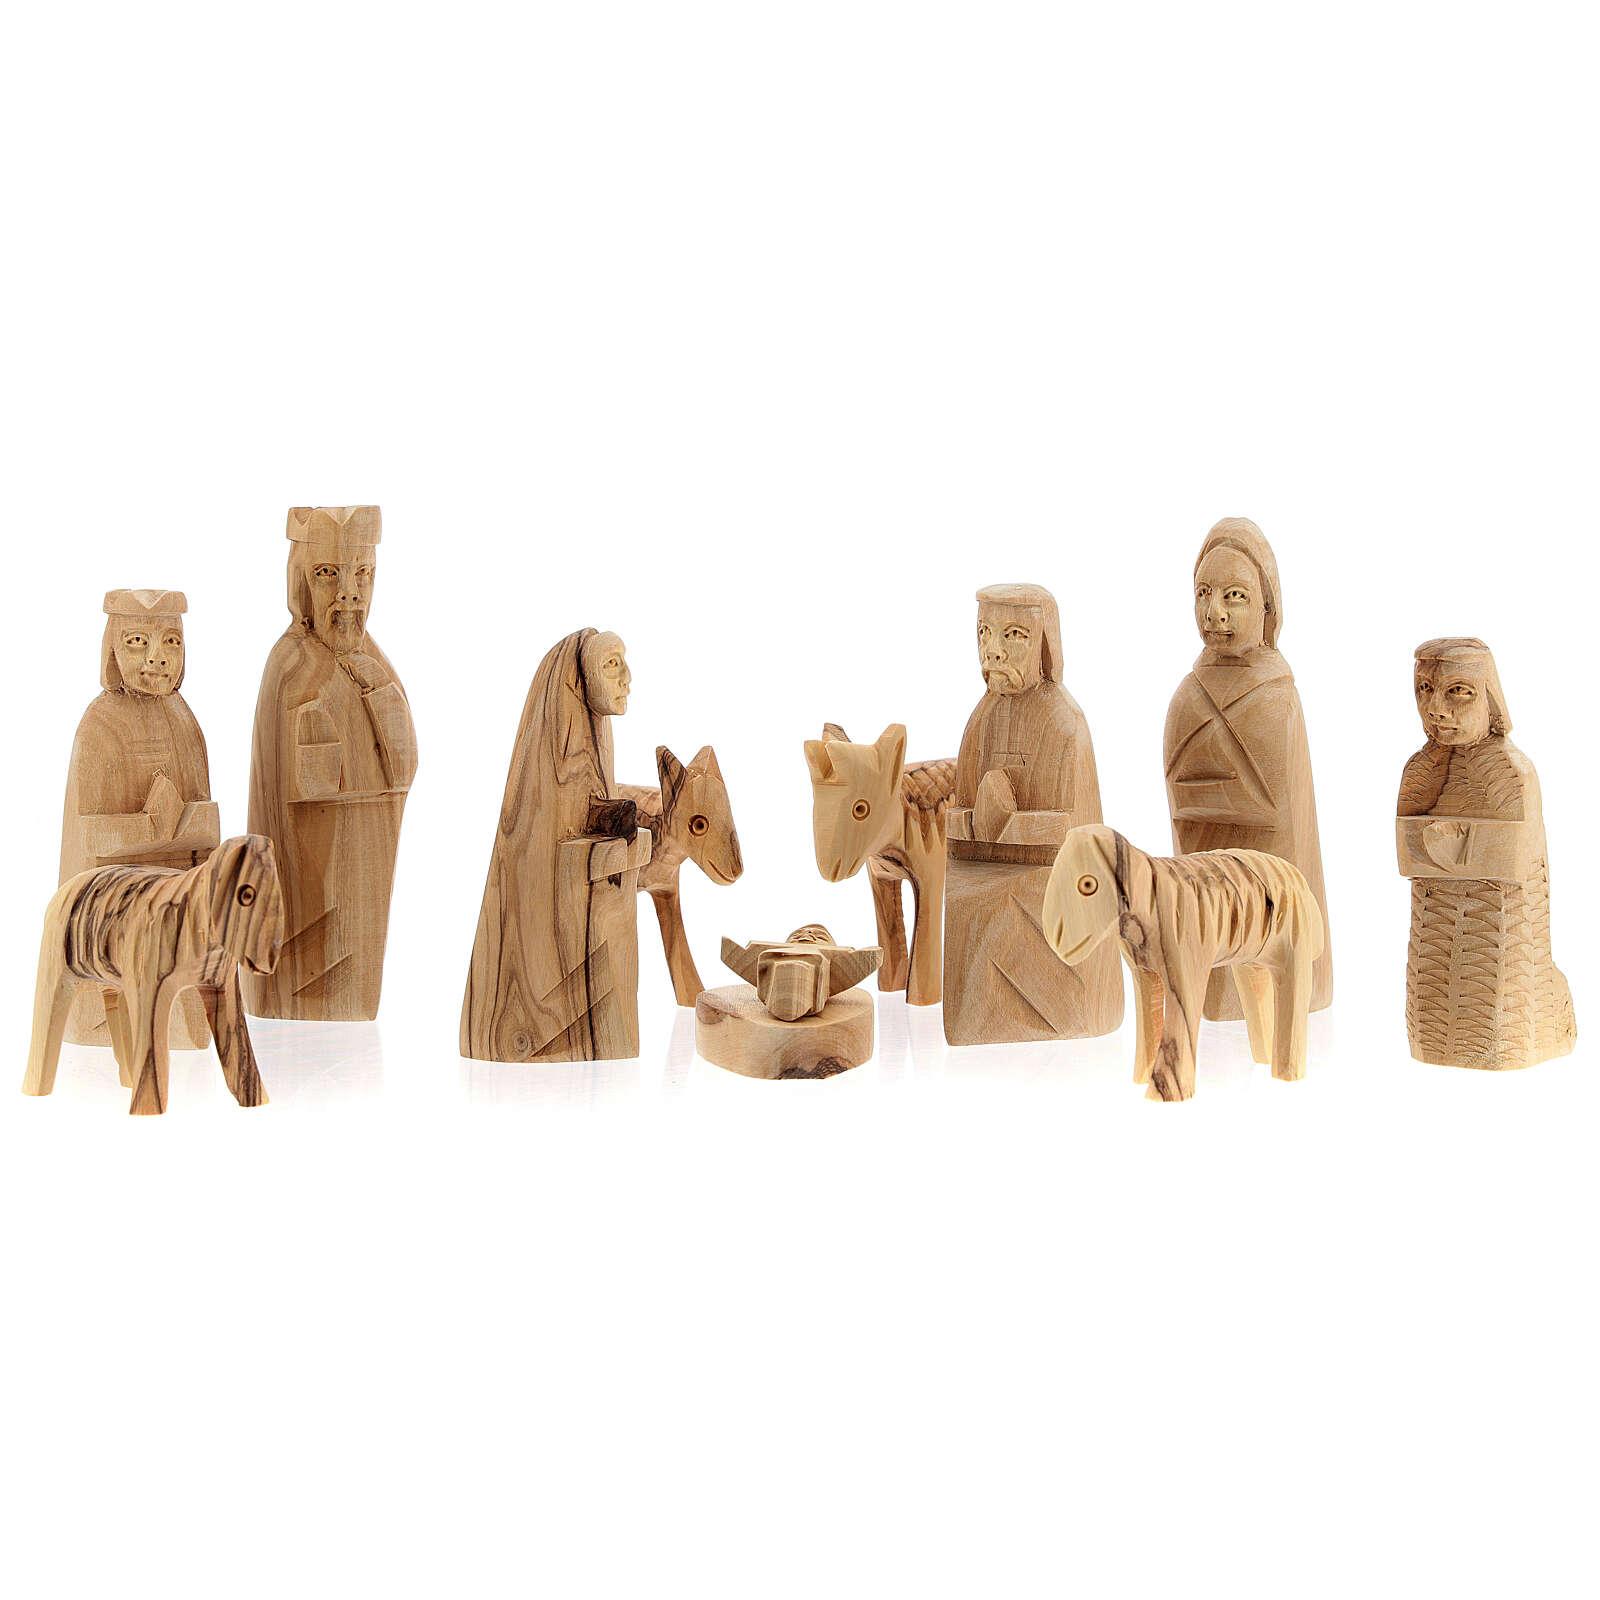 Capanna Natività tronco legno ulivo 11 statue 10 cm Betlemme 20x30x20 cm 4